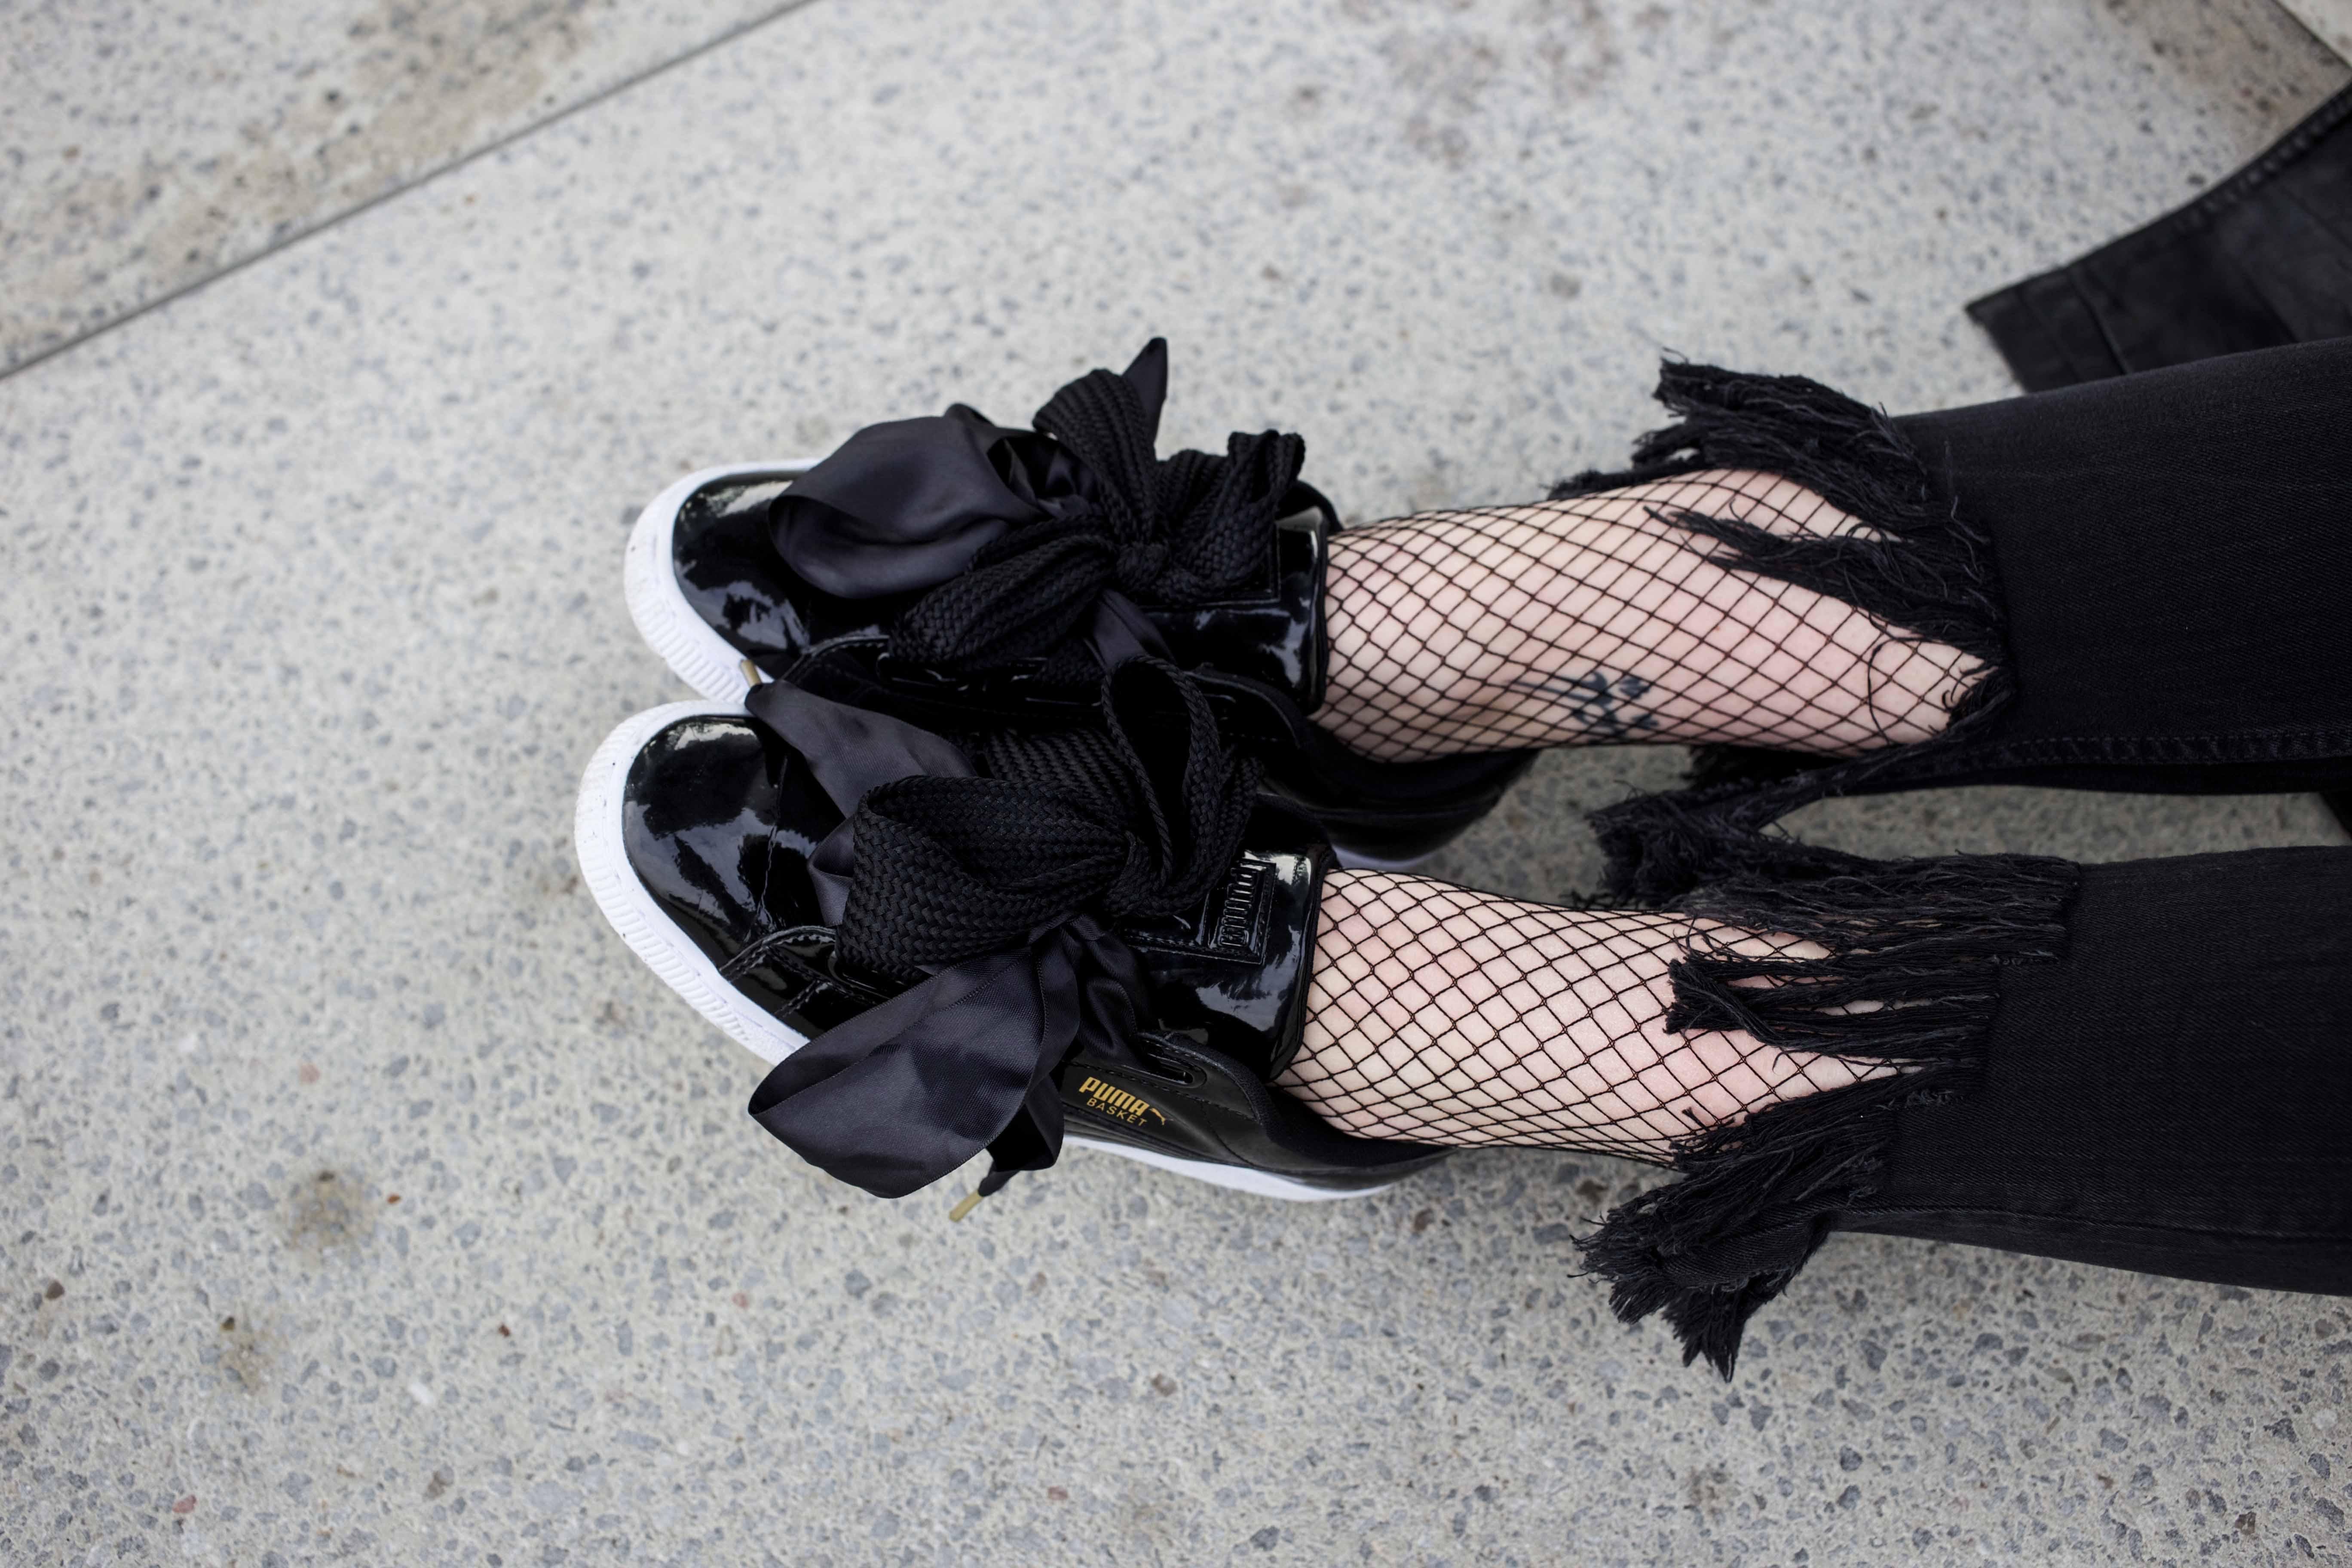 Netzstrumpfhose-kombinieren-Trend-Outfit-Fashionblog-PUMA-Basket-Ledermante_9543